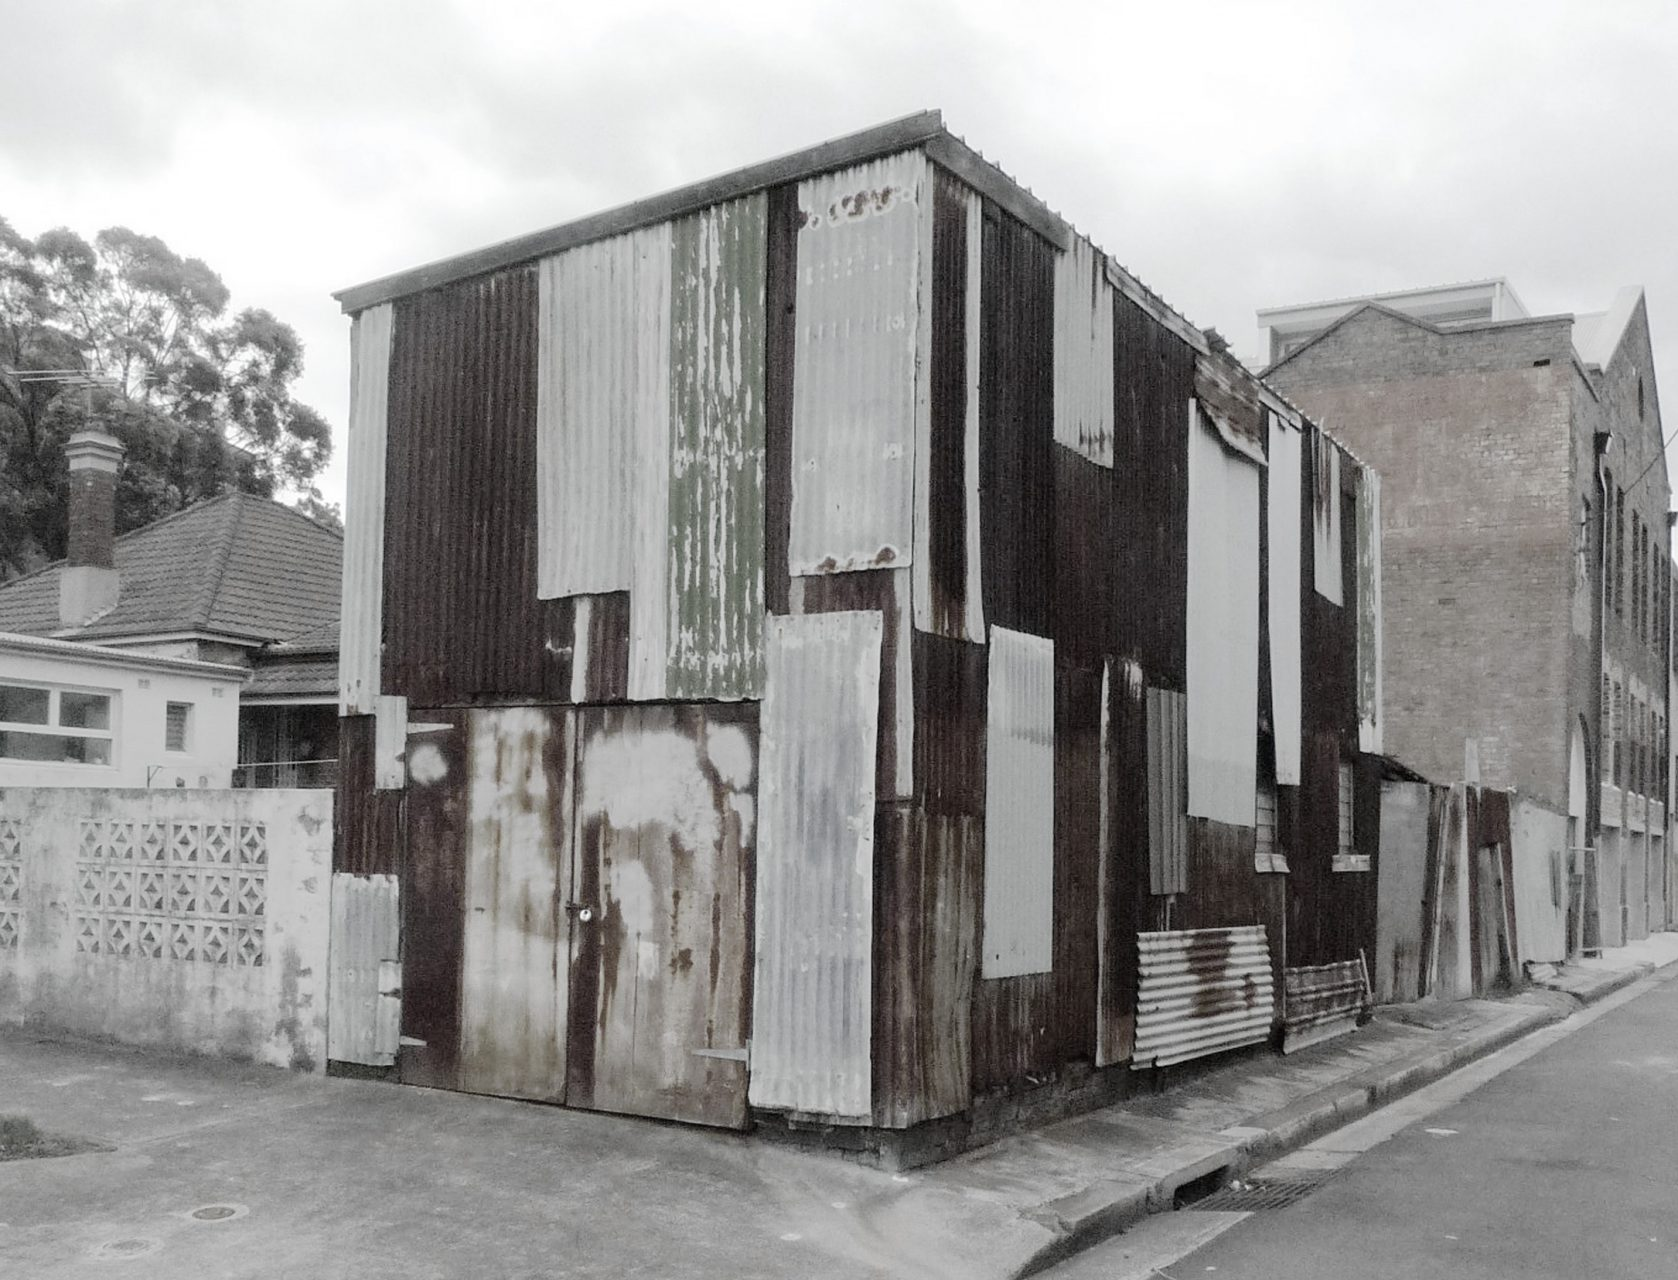 Image 8 - Existing Structure ∏ Raffaello Rosselli